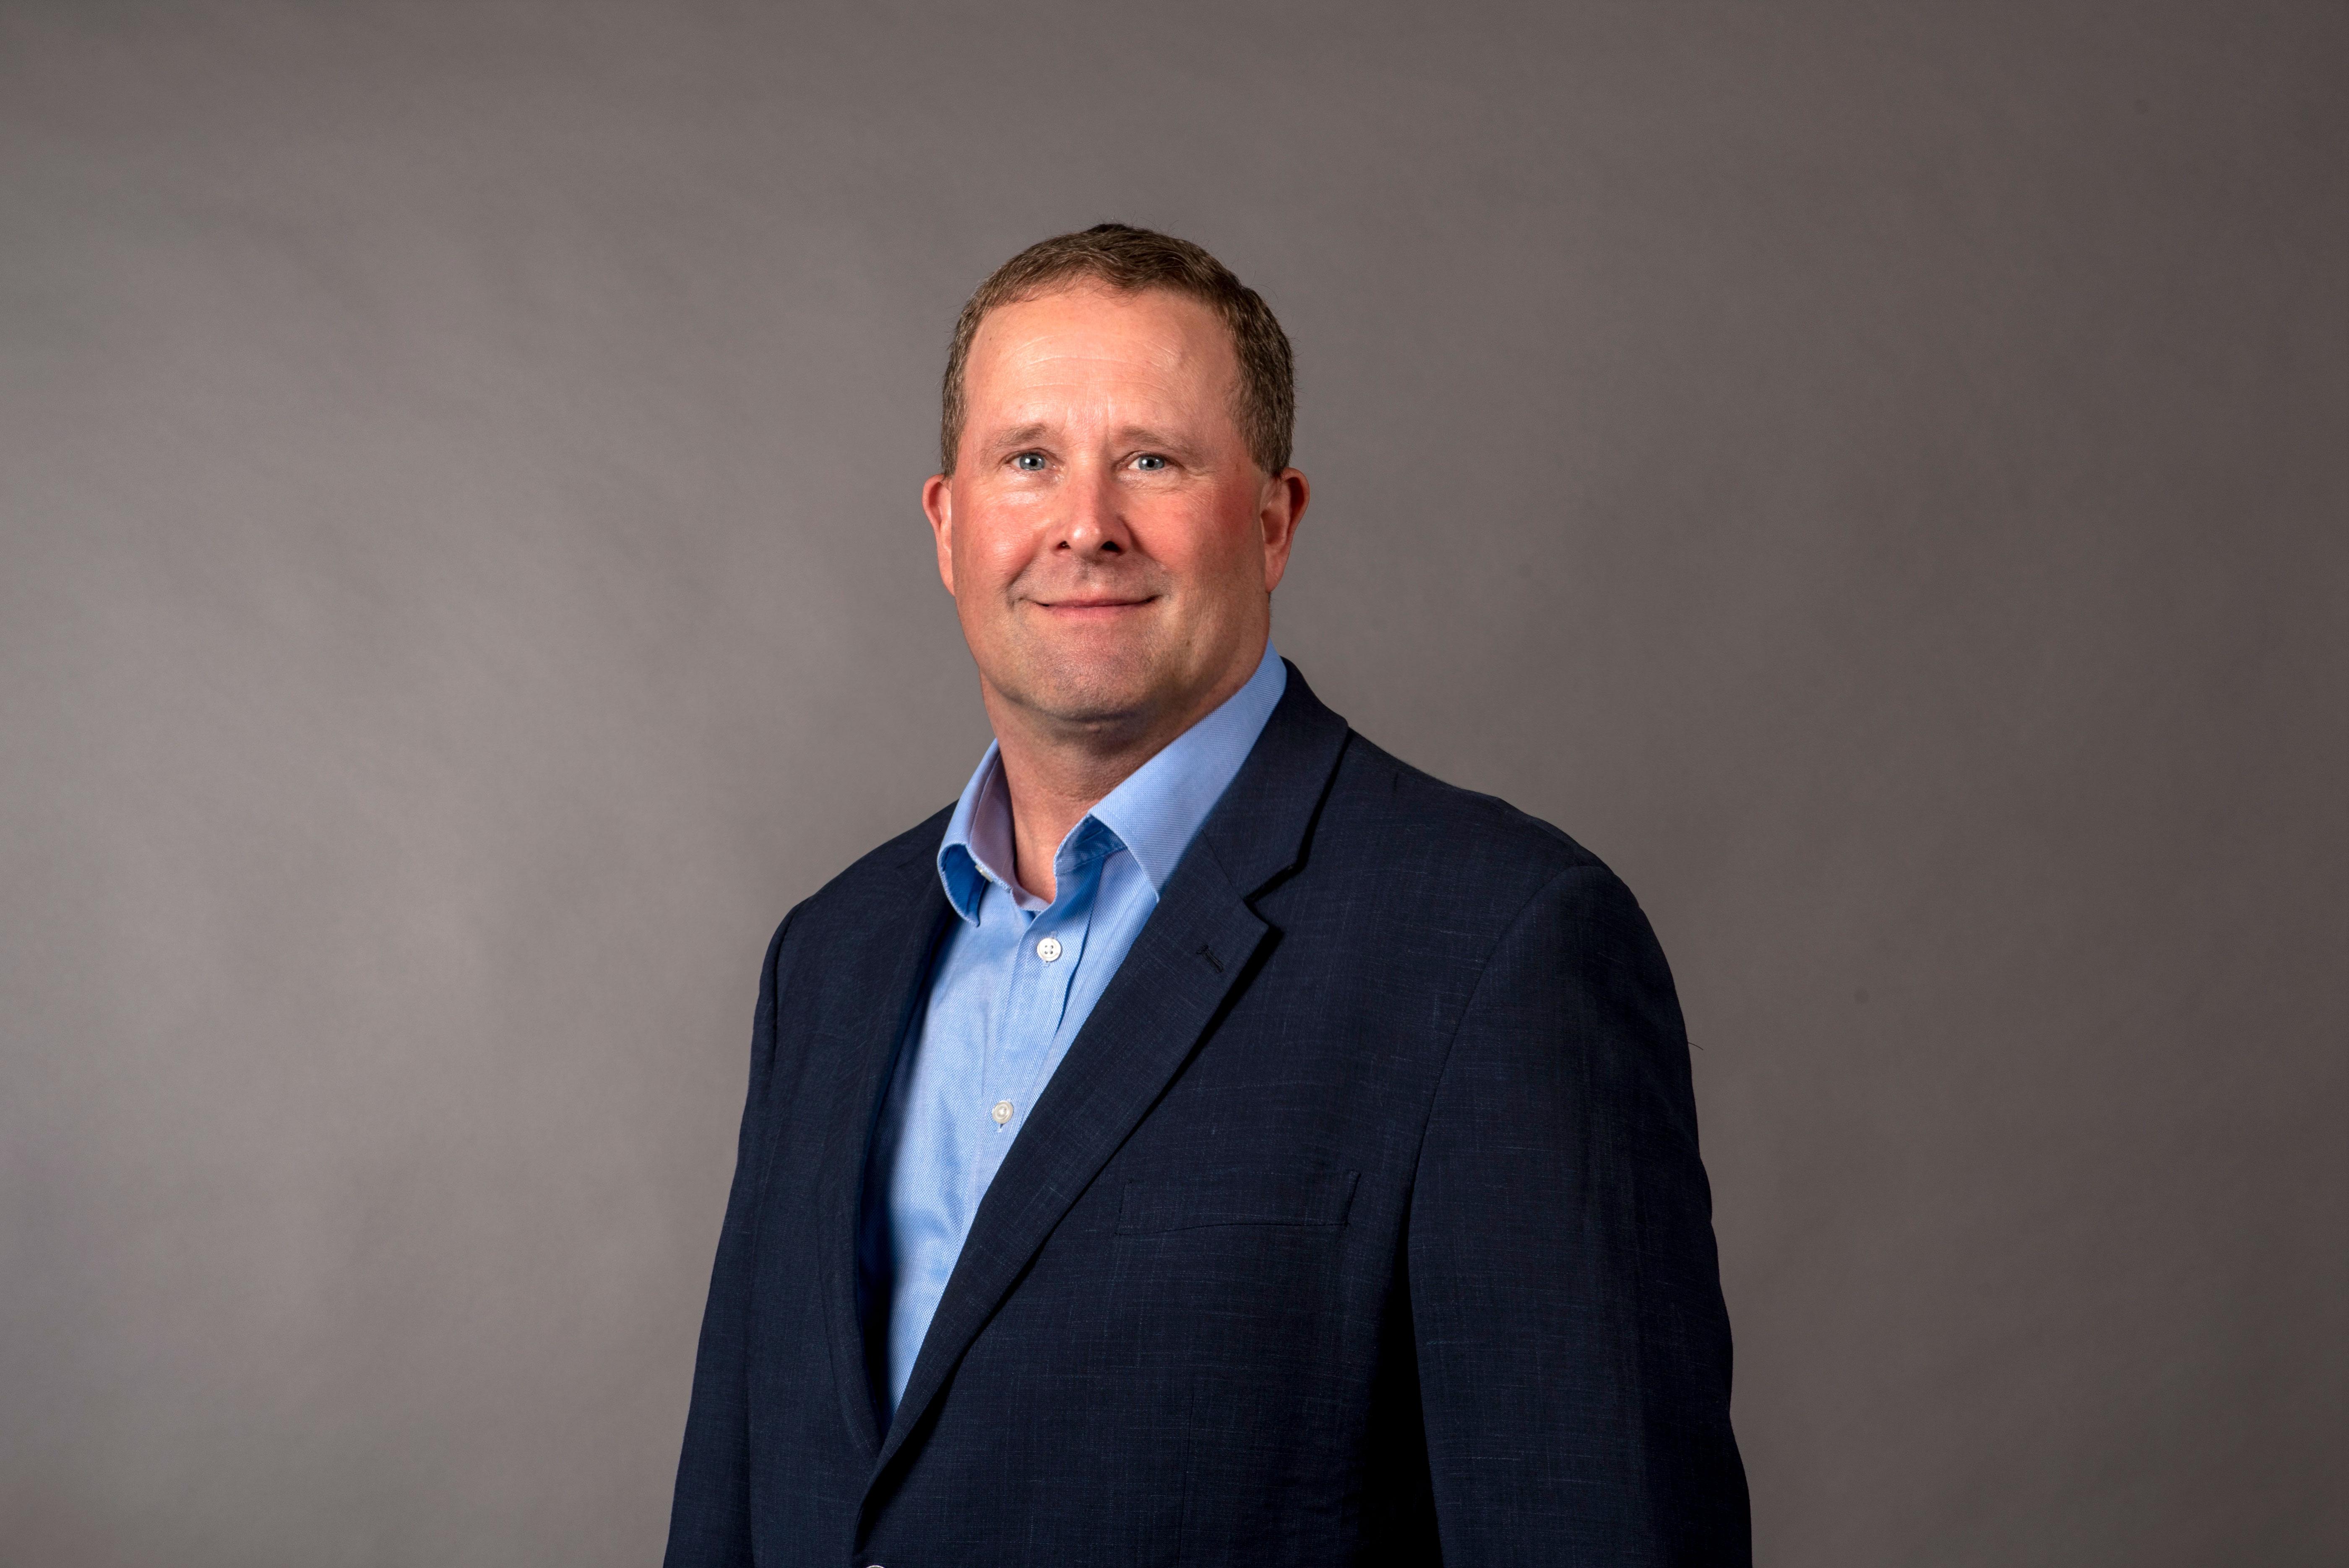 Ian Pitt: Ian Pitt, Chief Information Officer, Progress Software